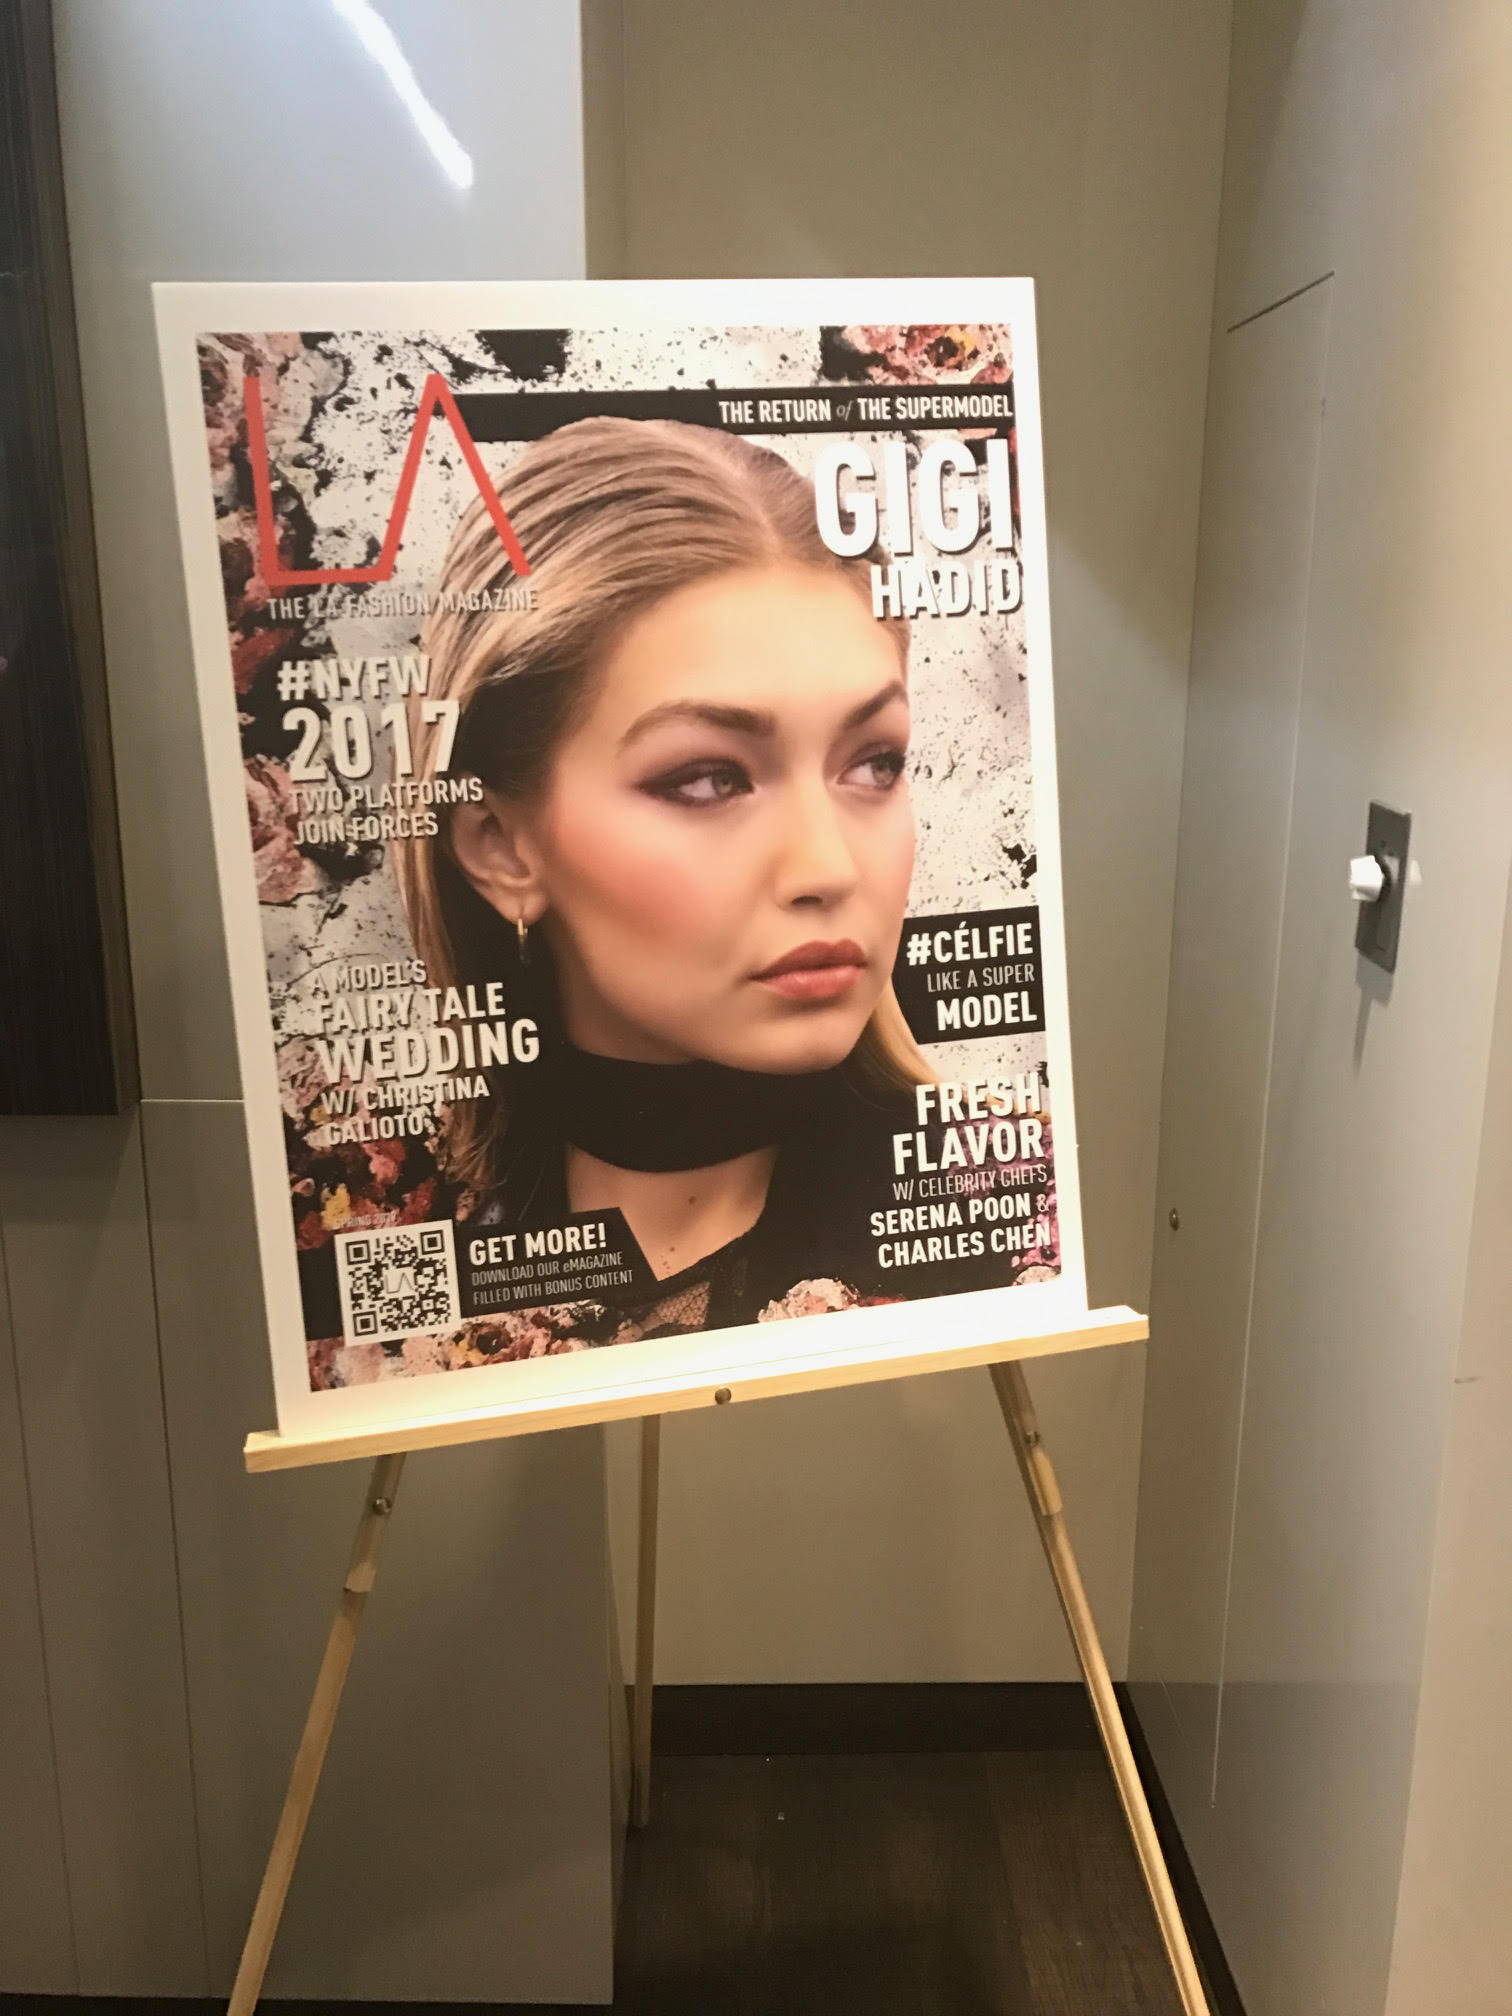 The LA Fashion Magazine (LAFM) - 2017 Spring issue release party